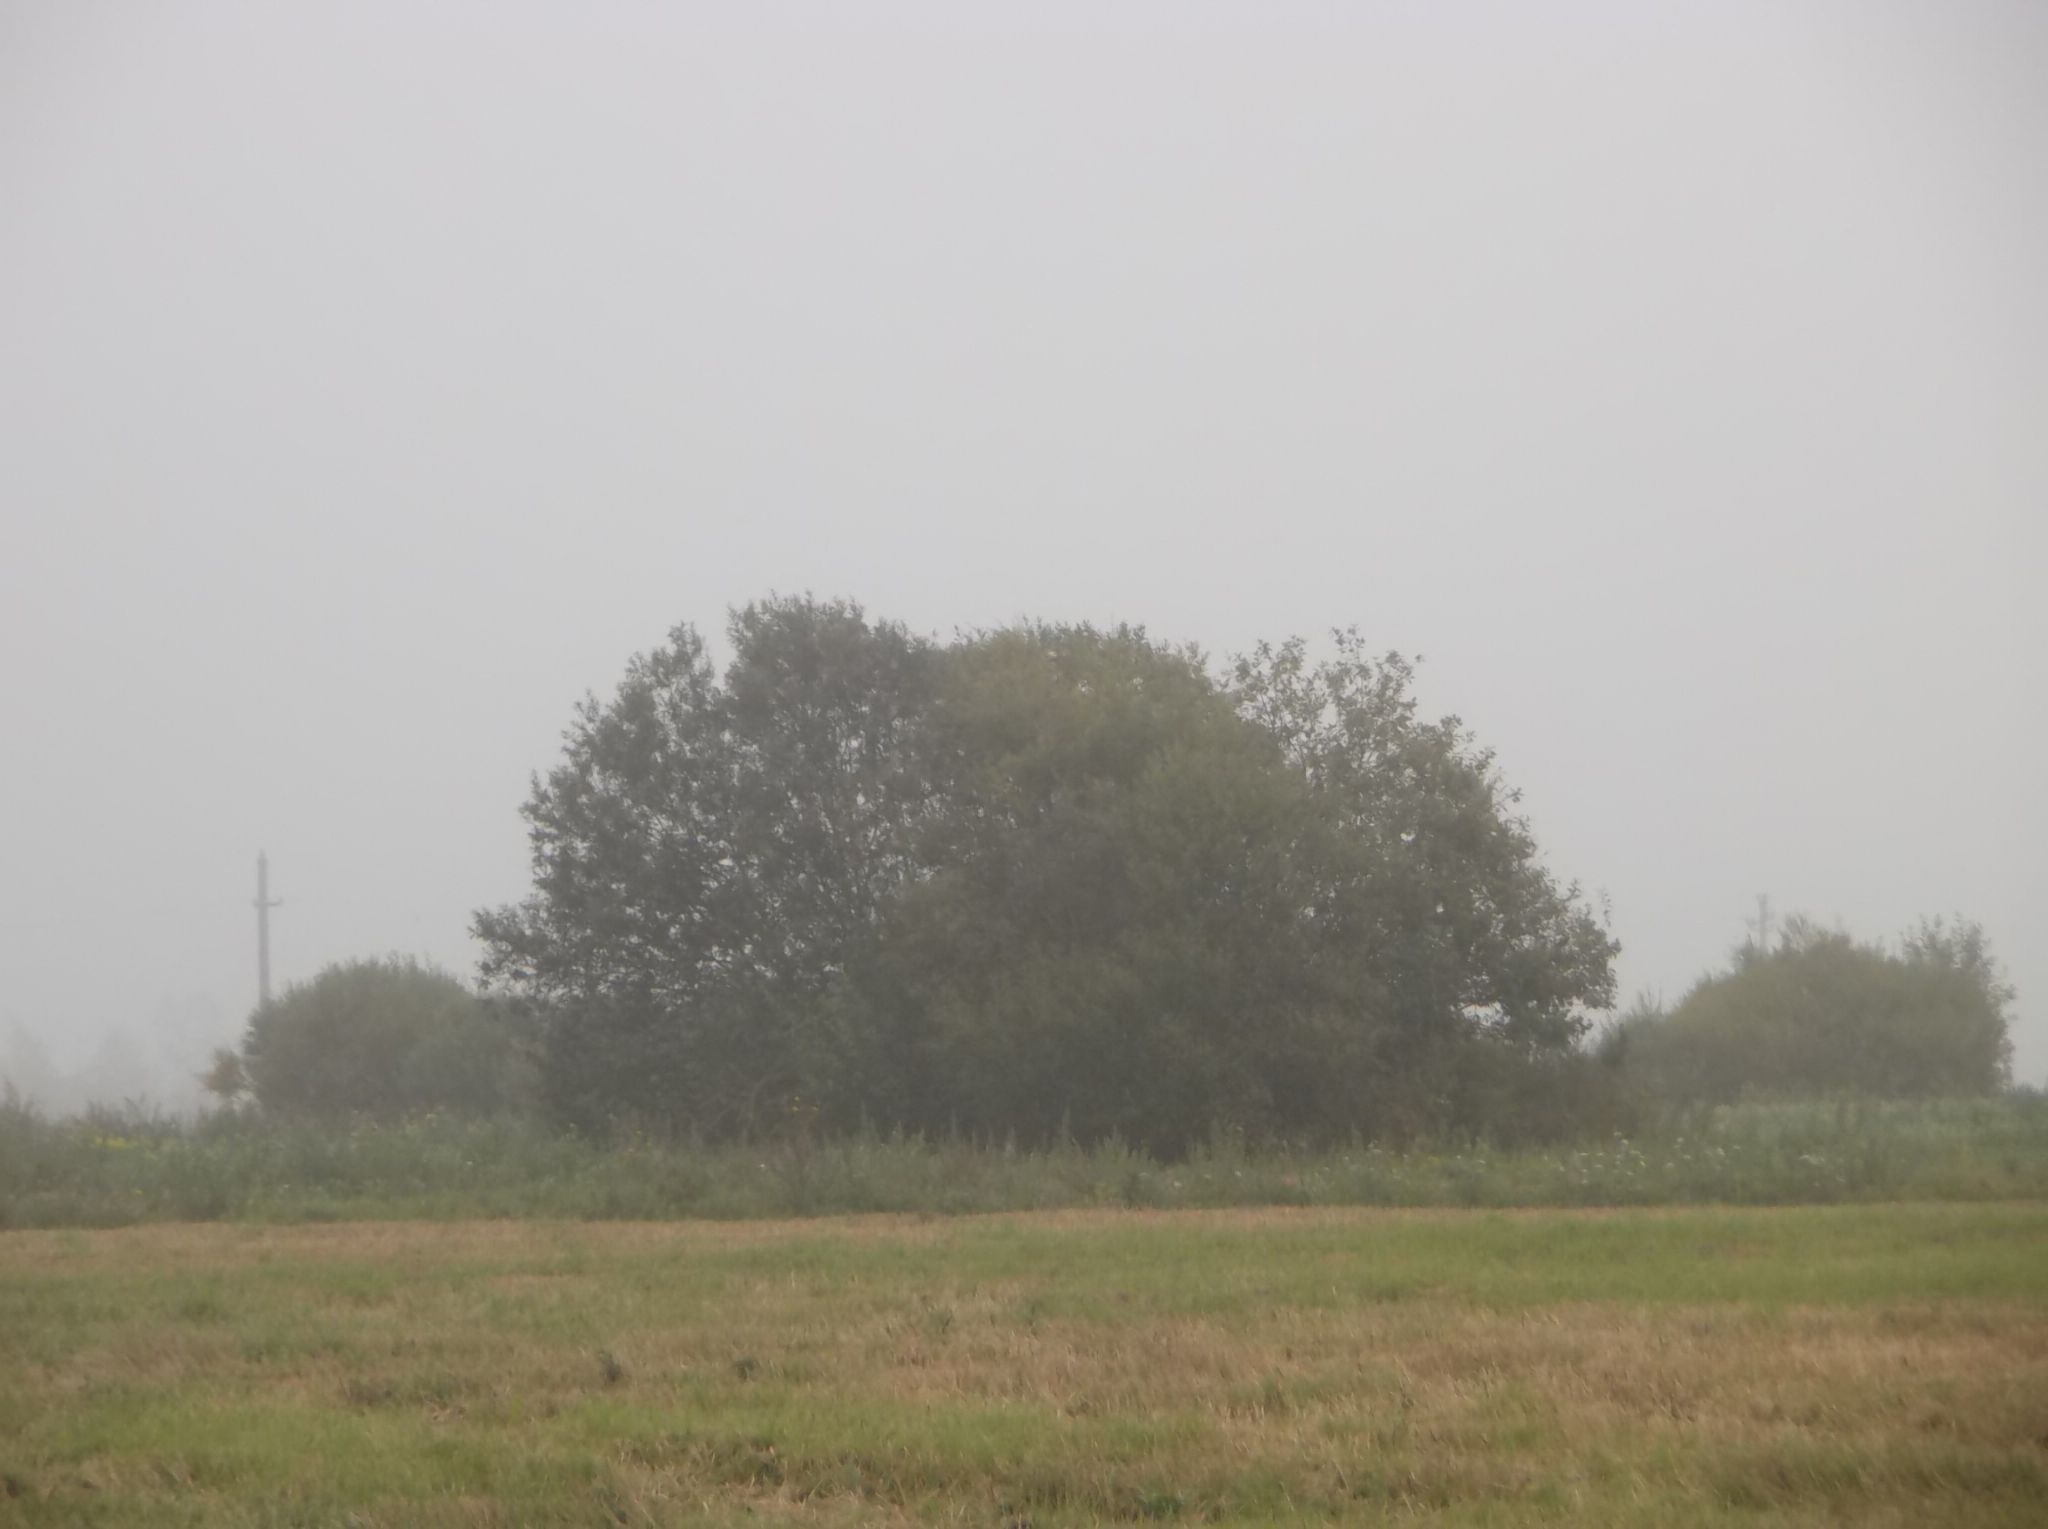 In the fog. by Zita Užkuraitienė